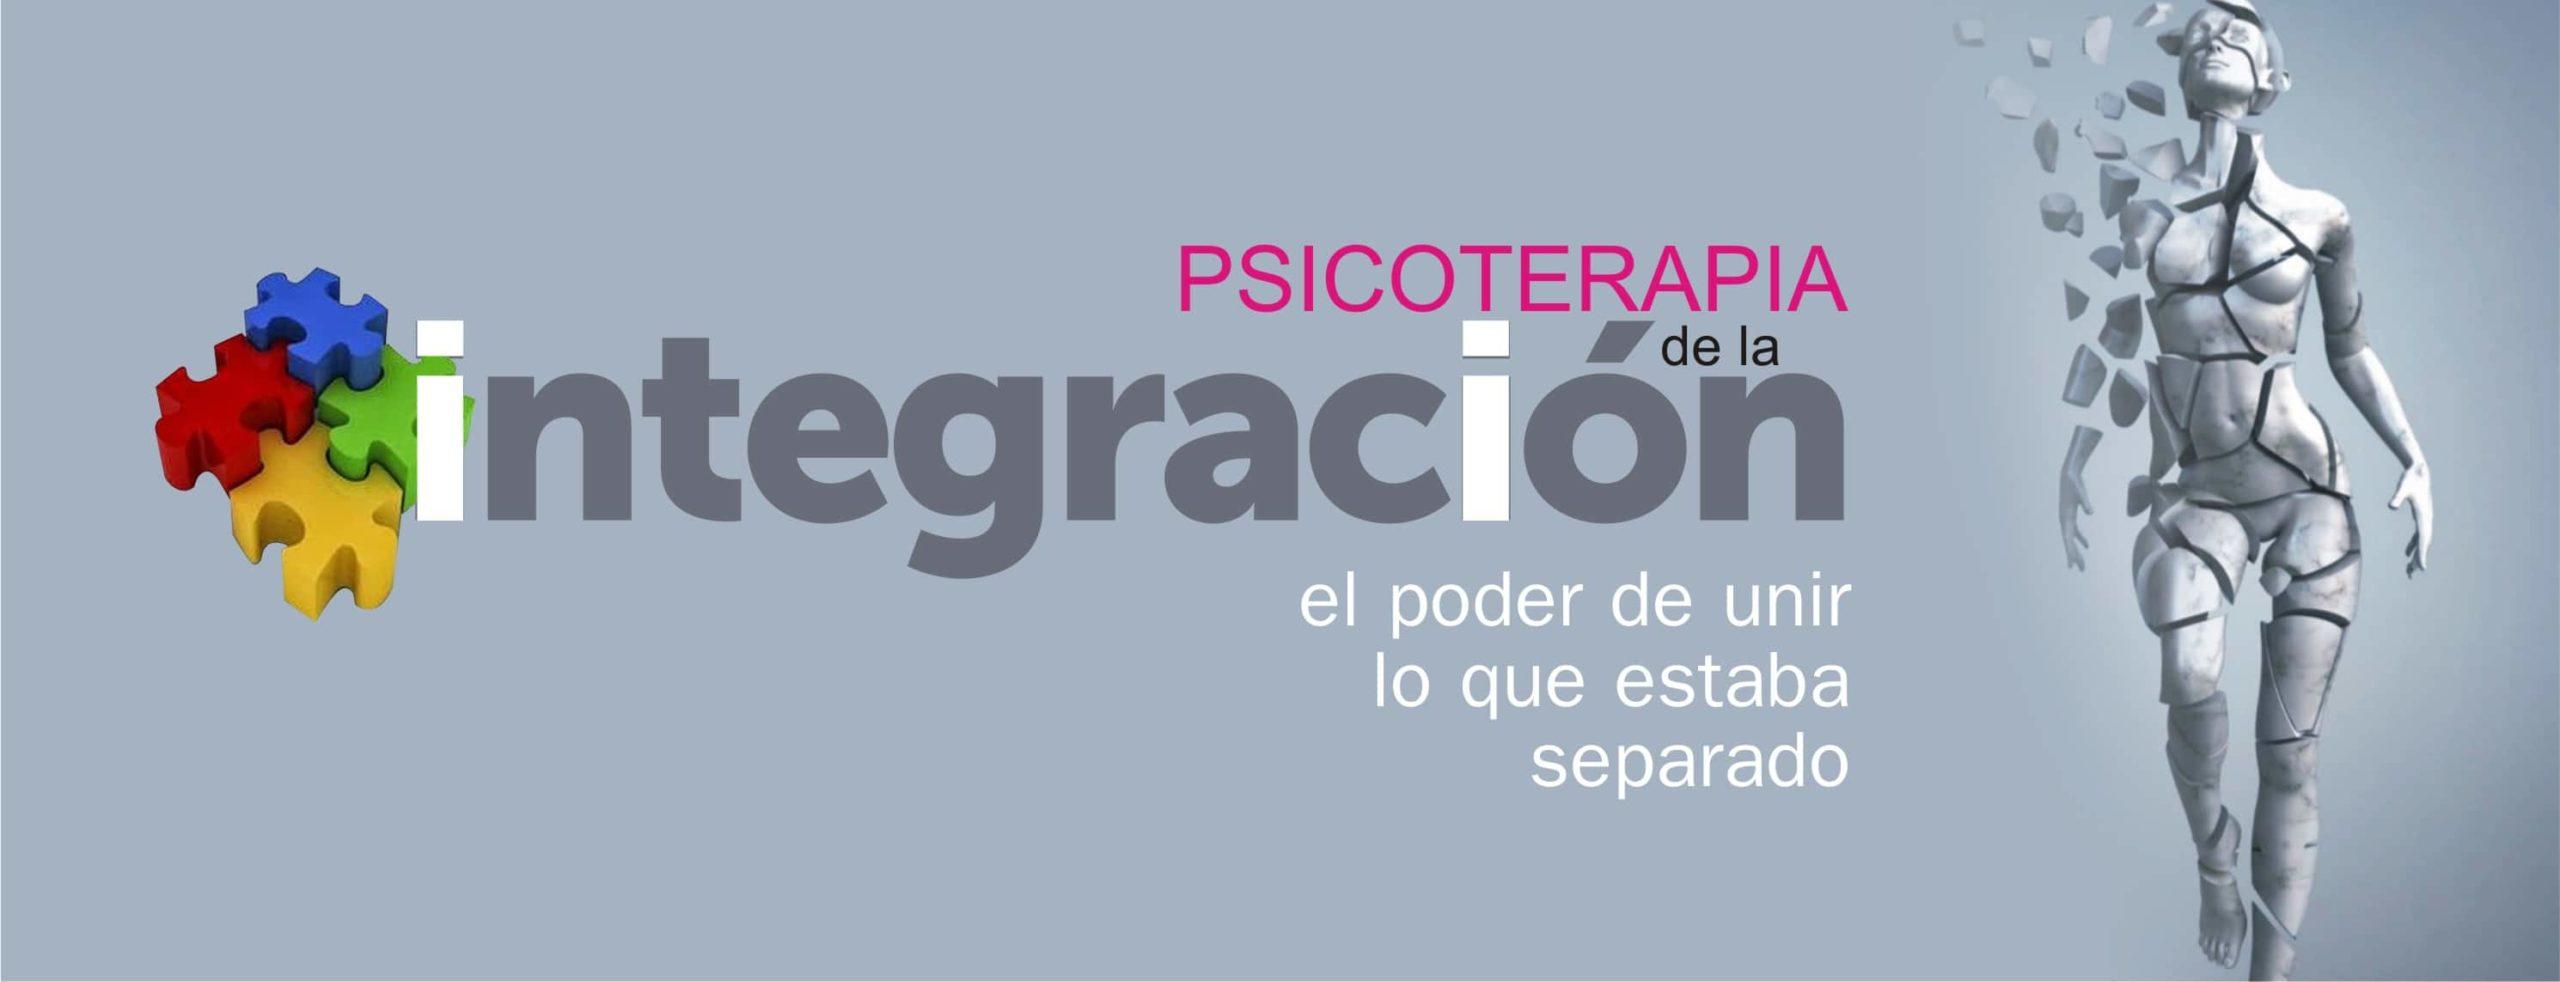 banners psicoterapia de la integracion